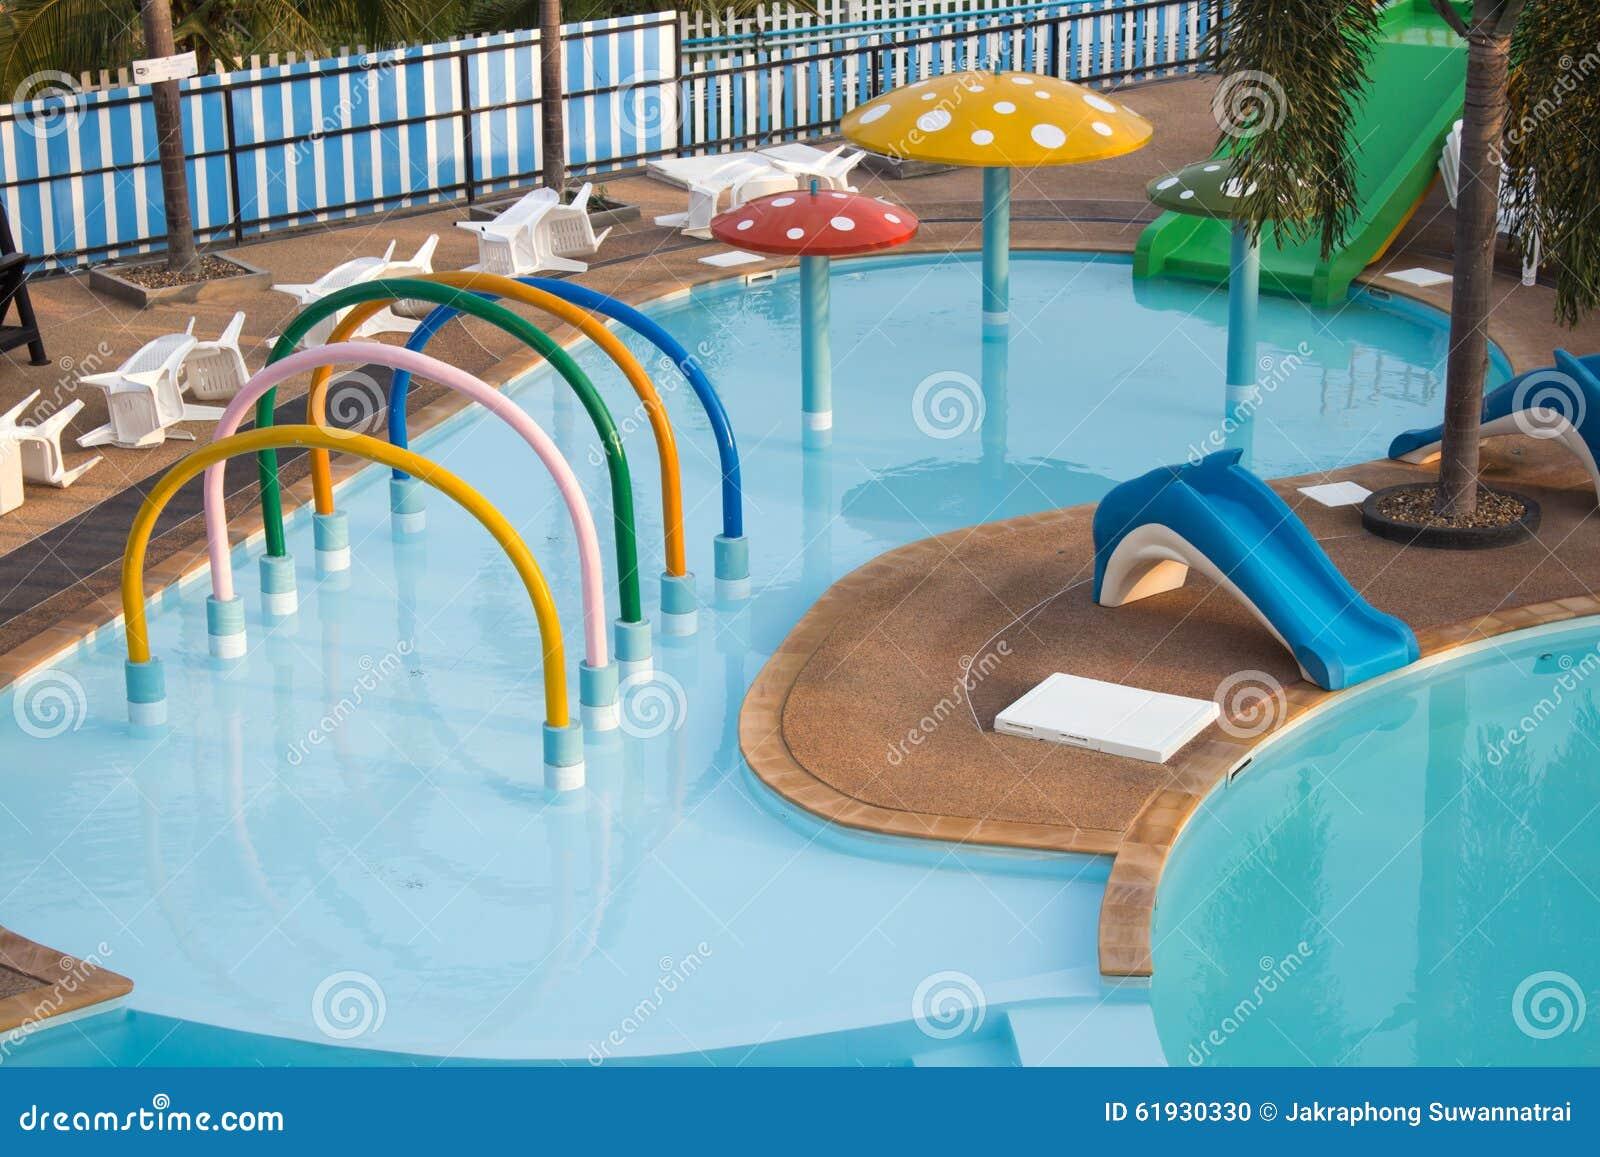 Kids Public Swimming Pool